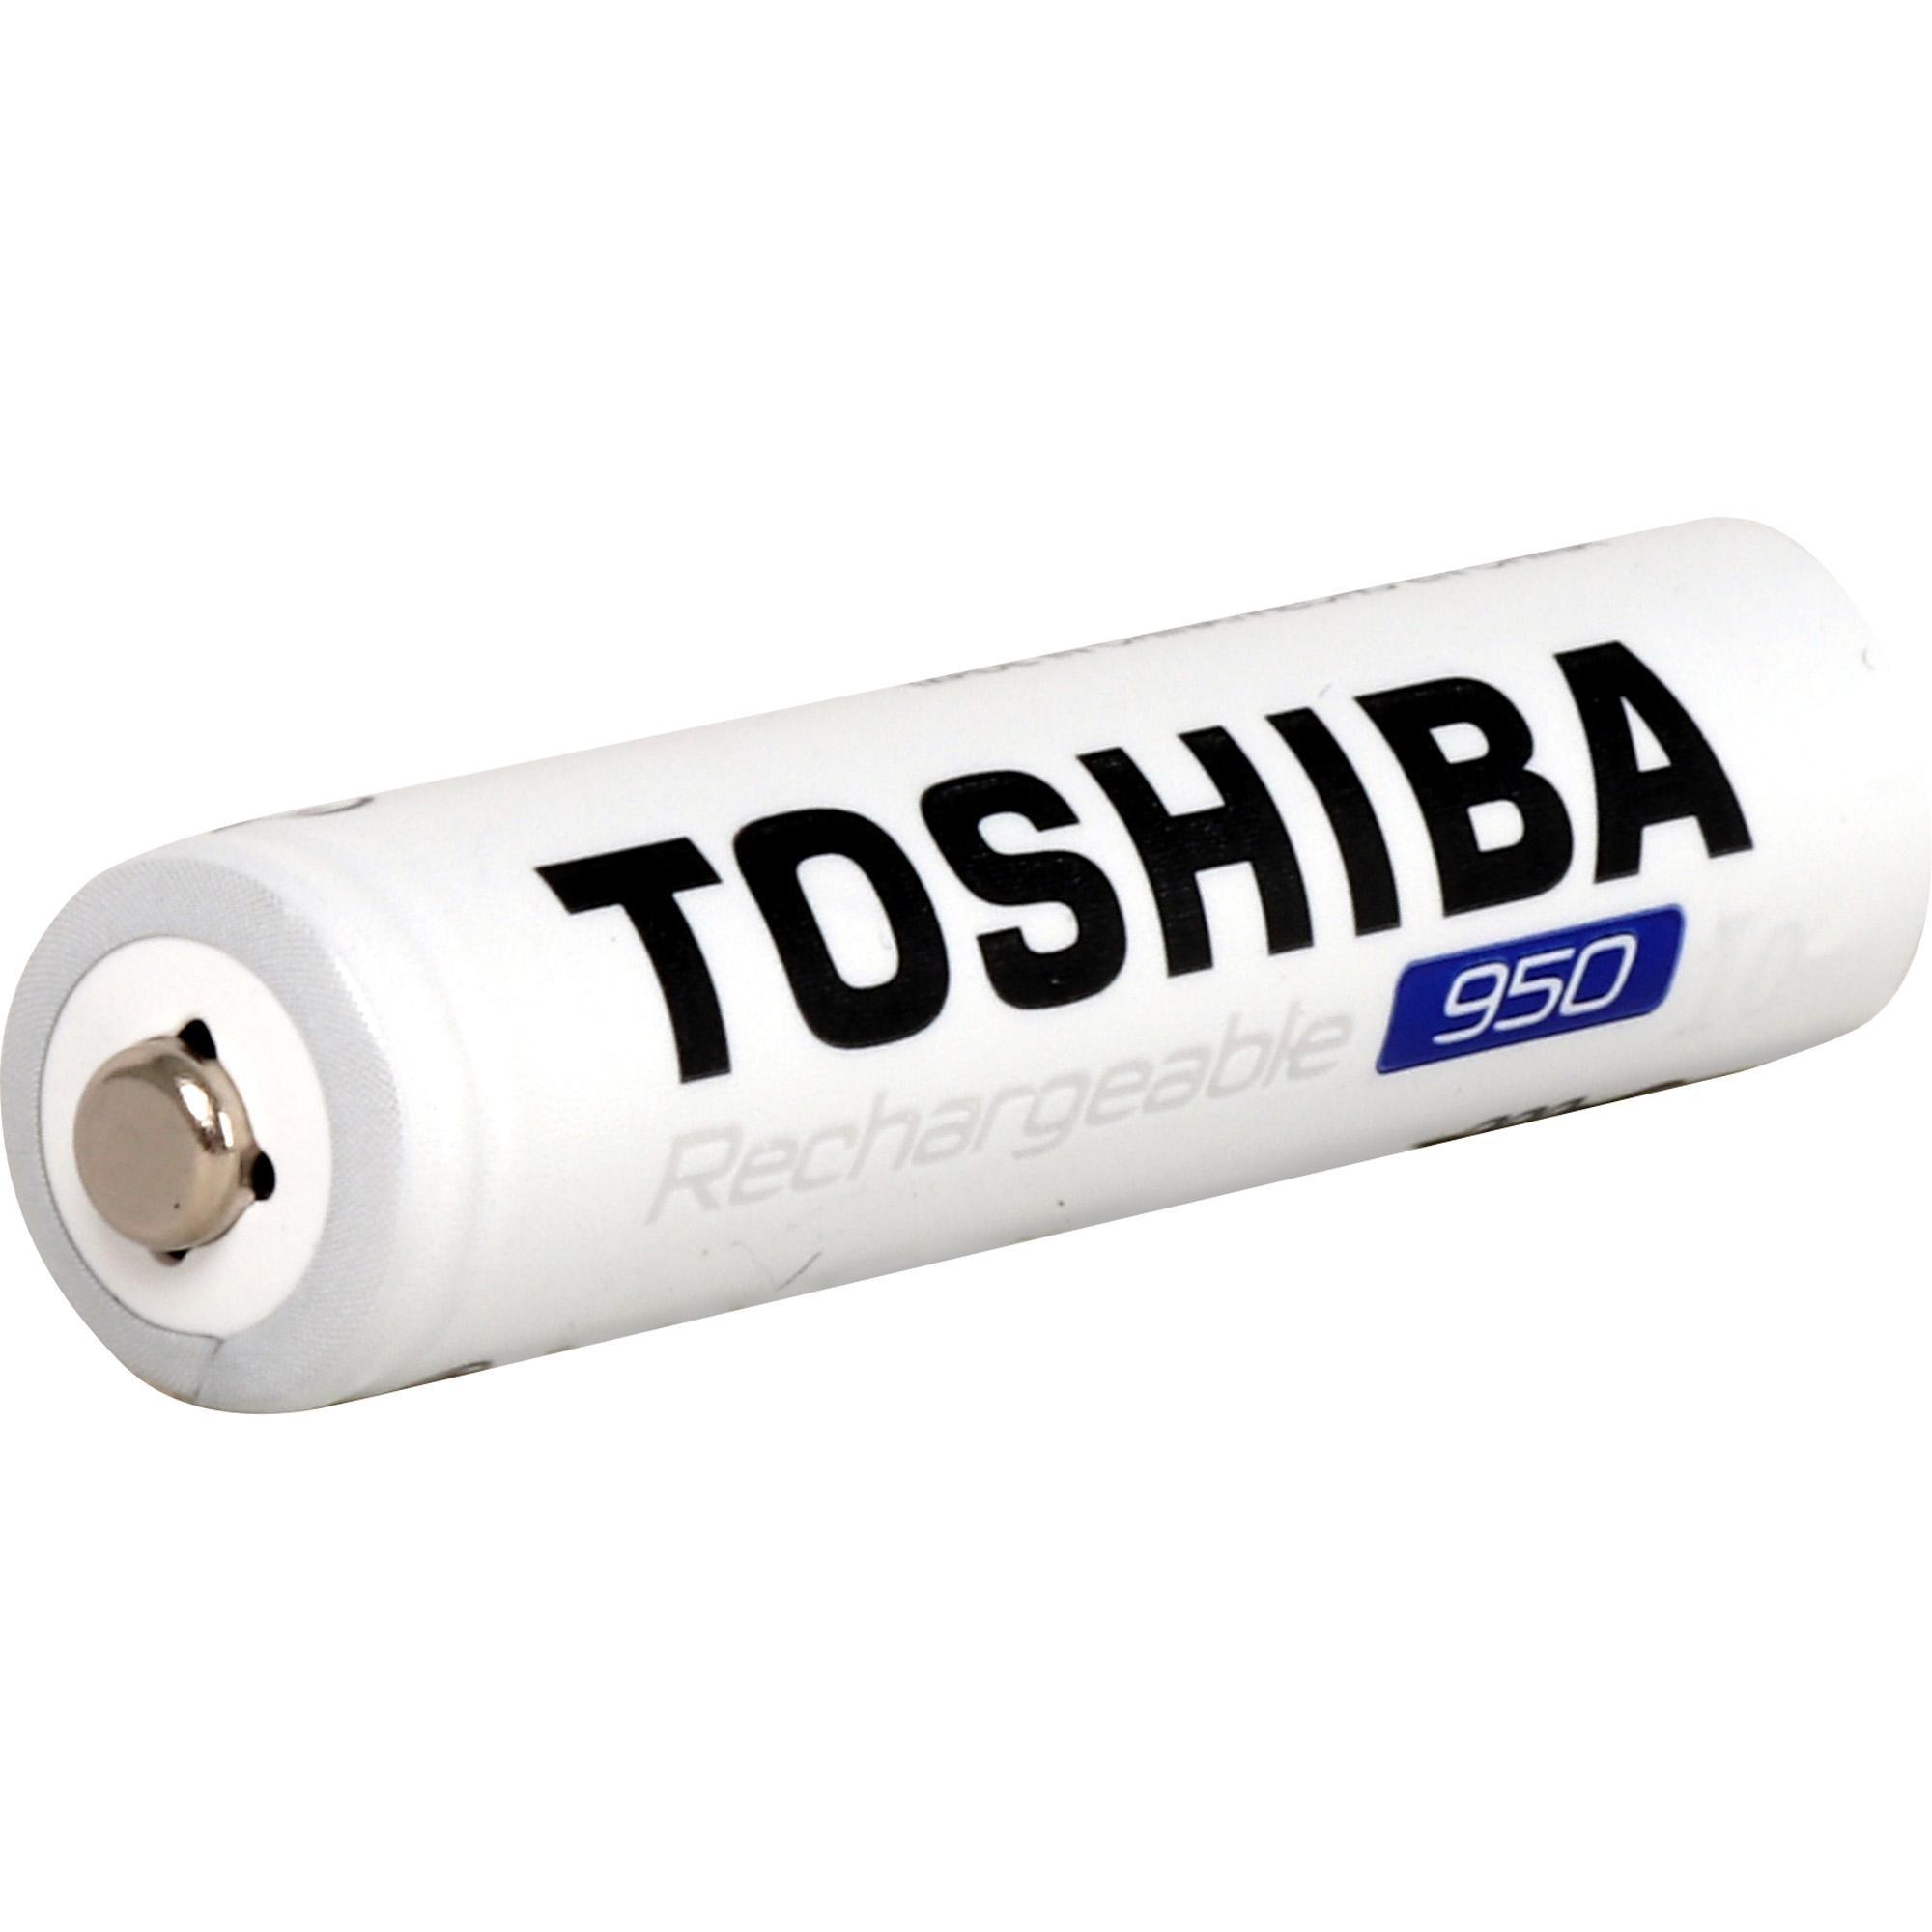 4 Pilhas Recarregáveis Toshiba AAA Palito 950mAh TNH-03GAE BP-4C 1,2v